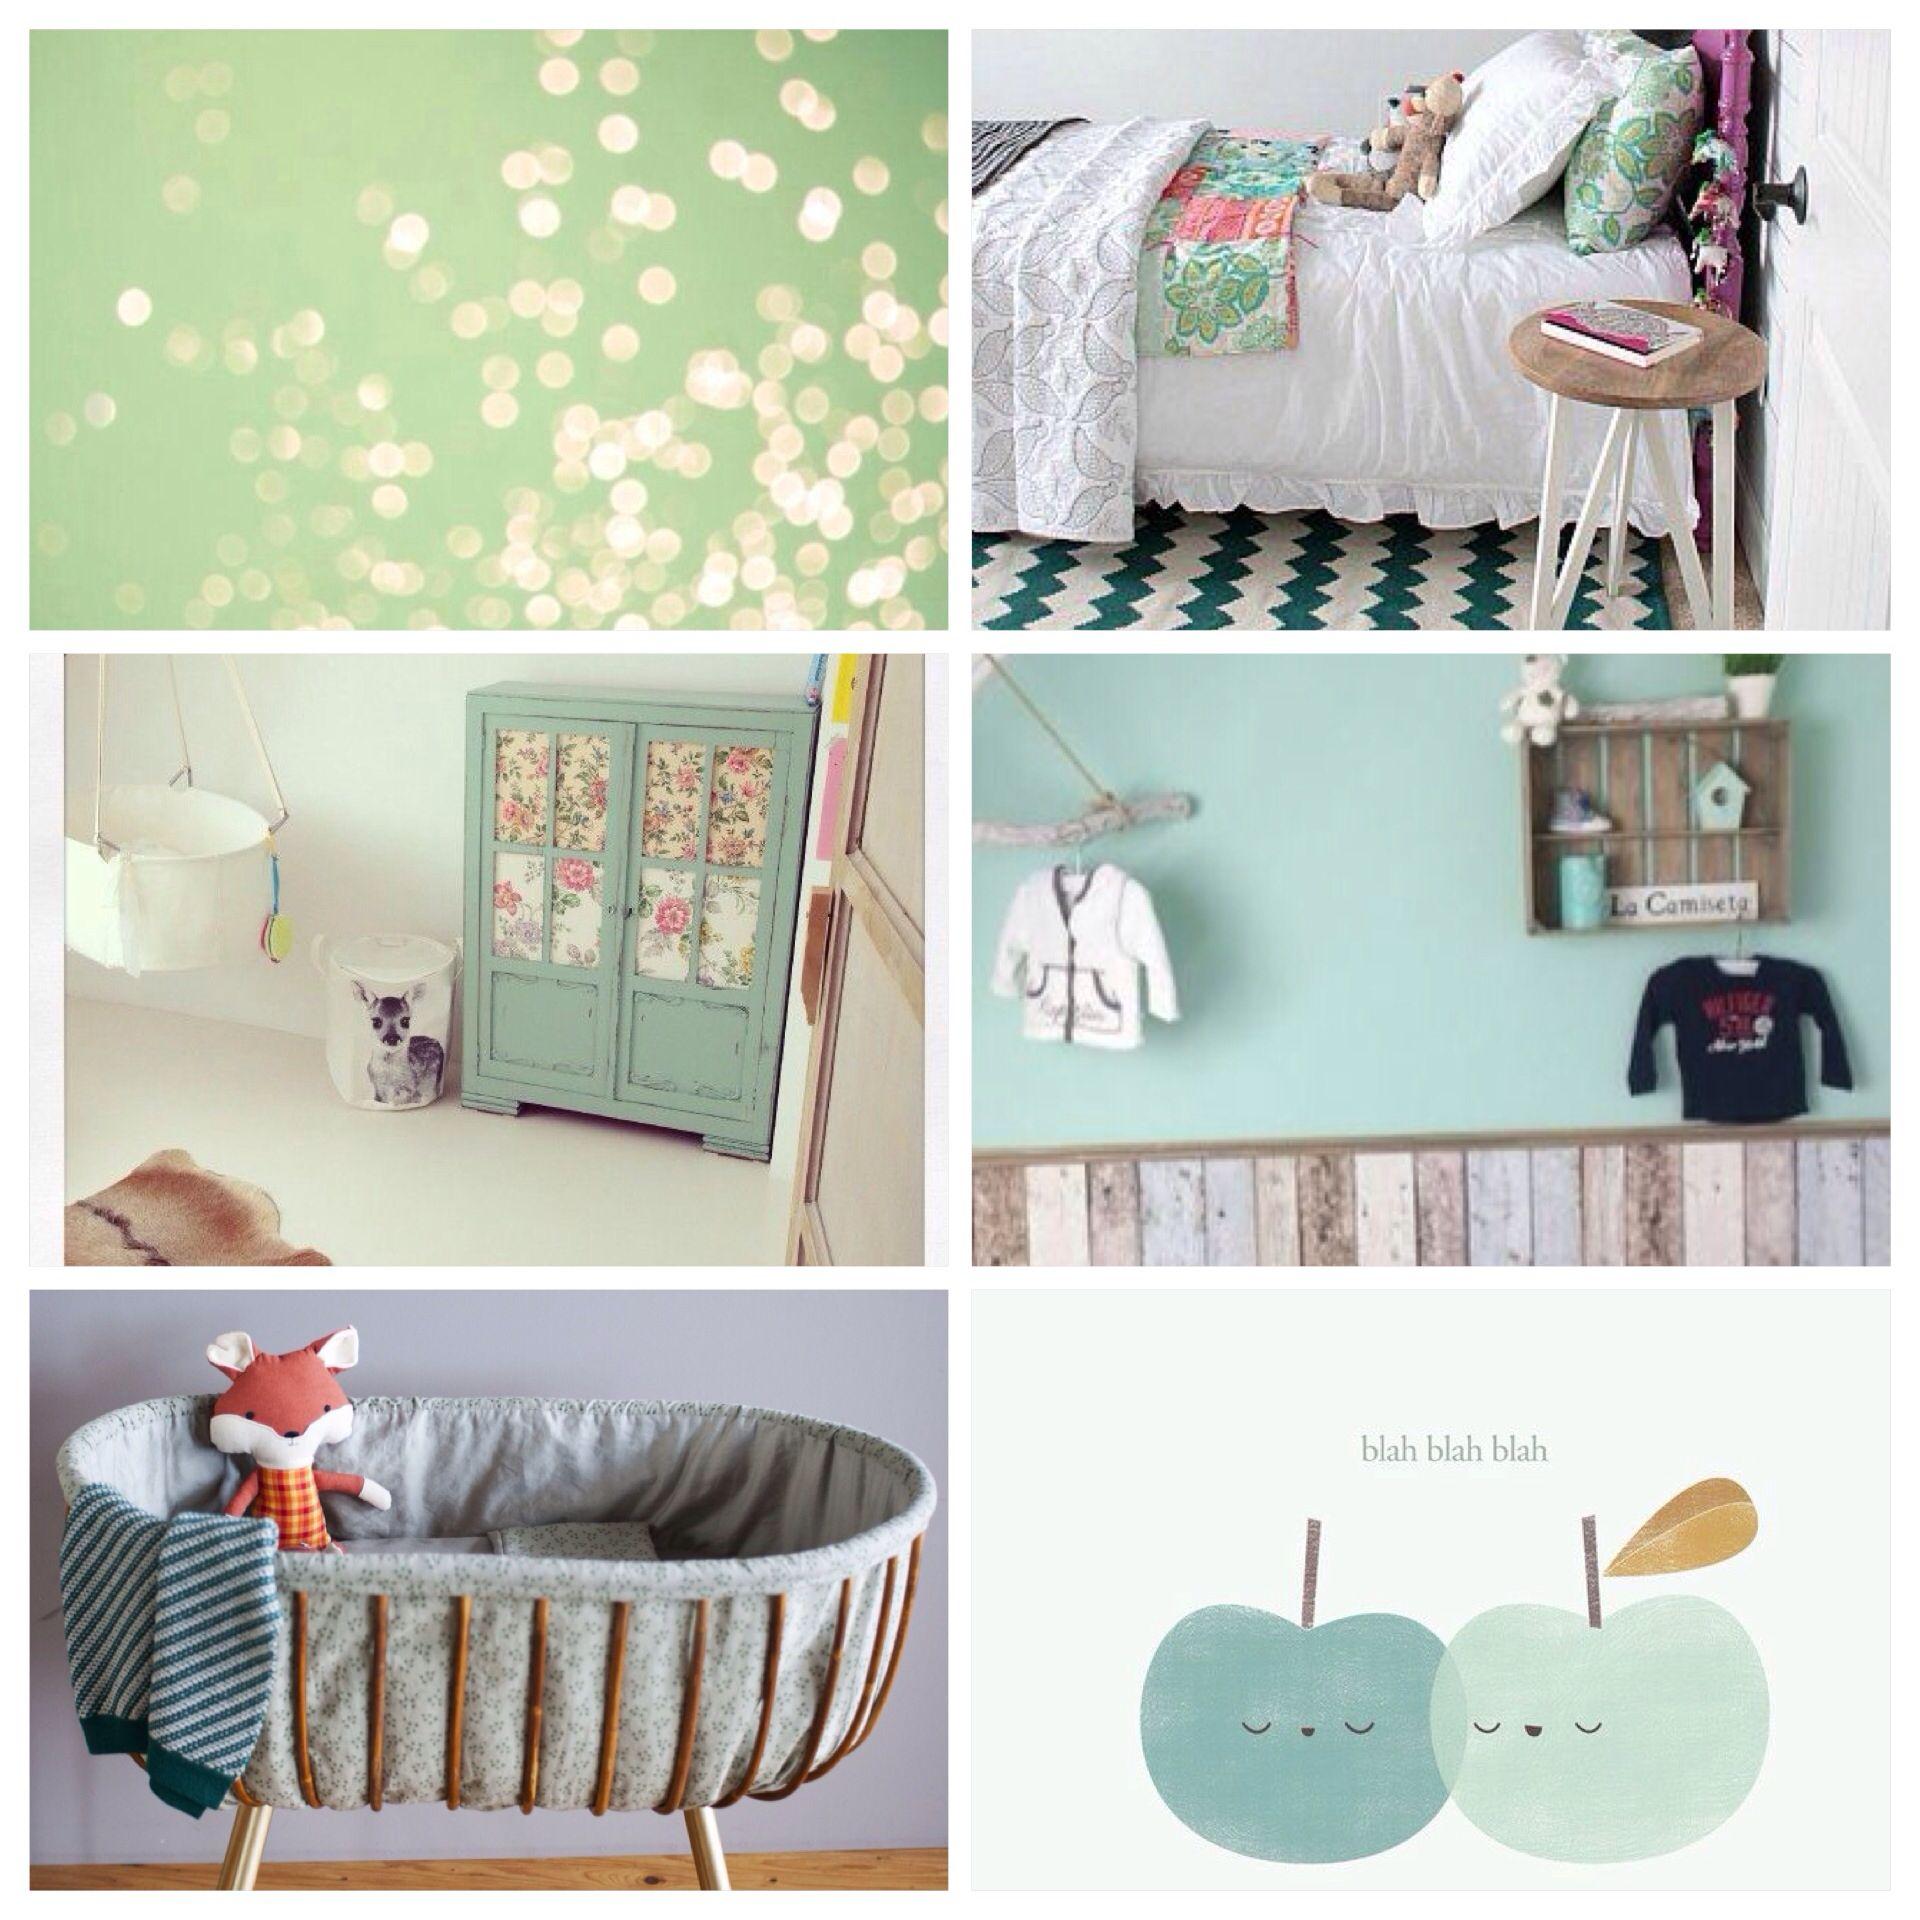 Kinderkamer idee  Baby  Pinterest